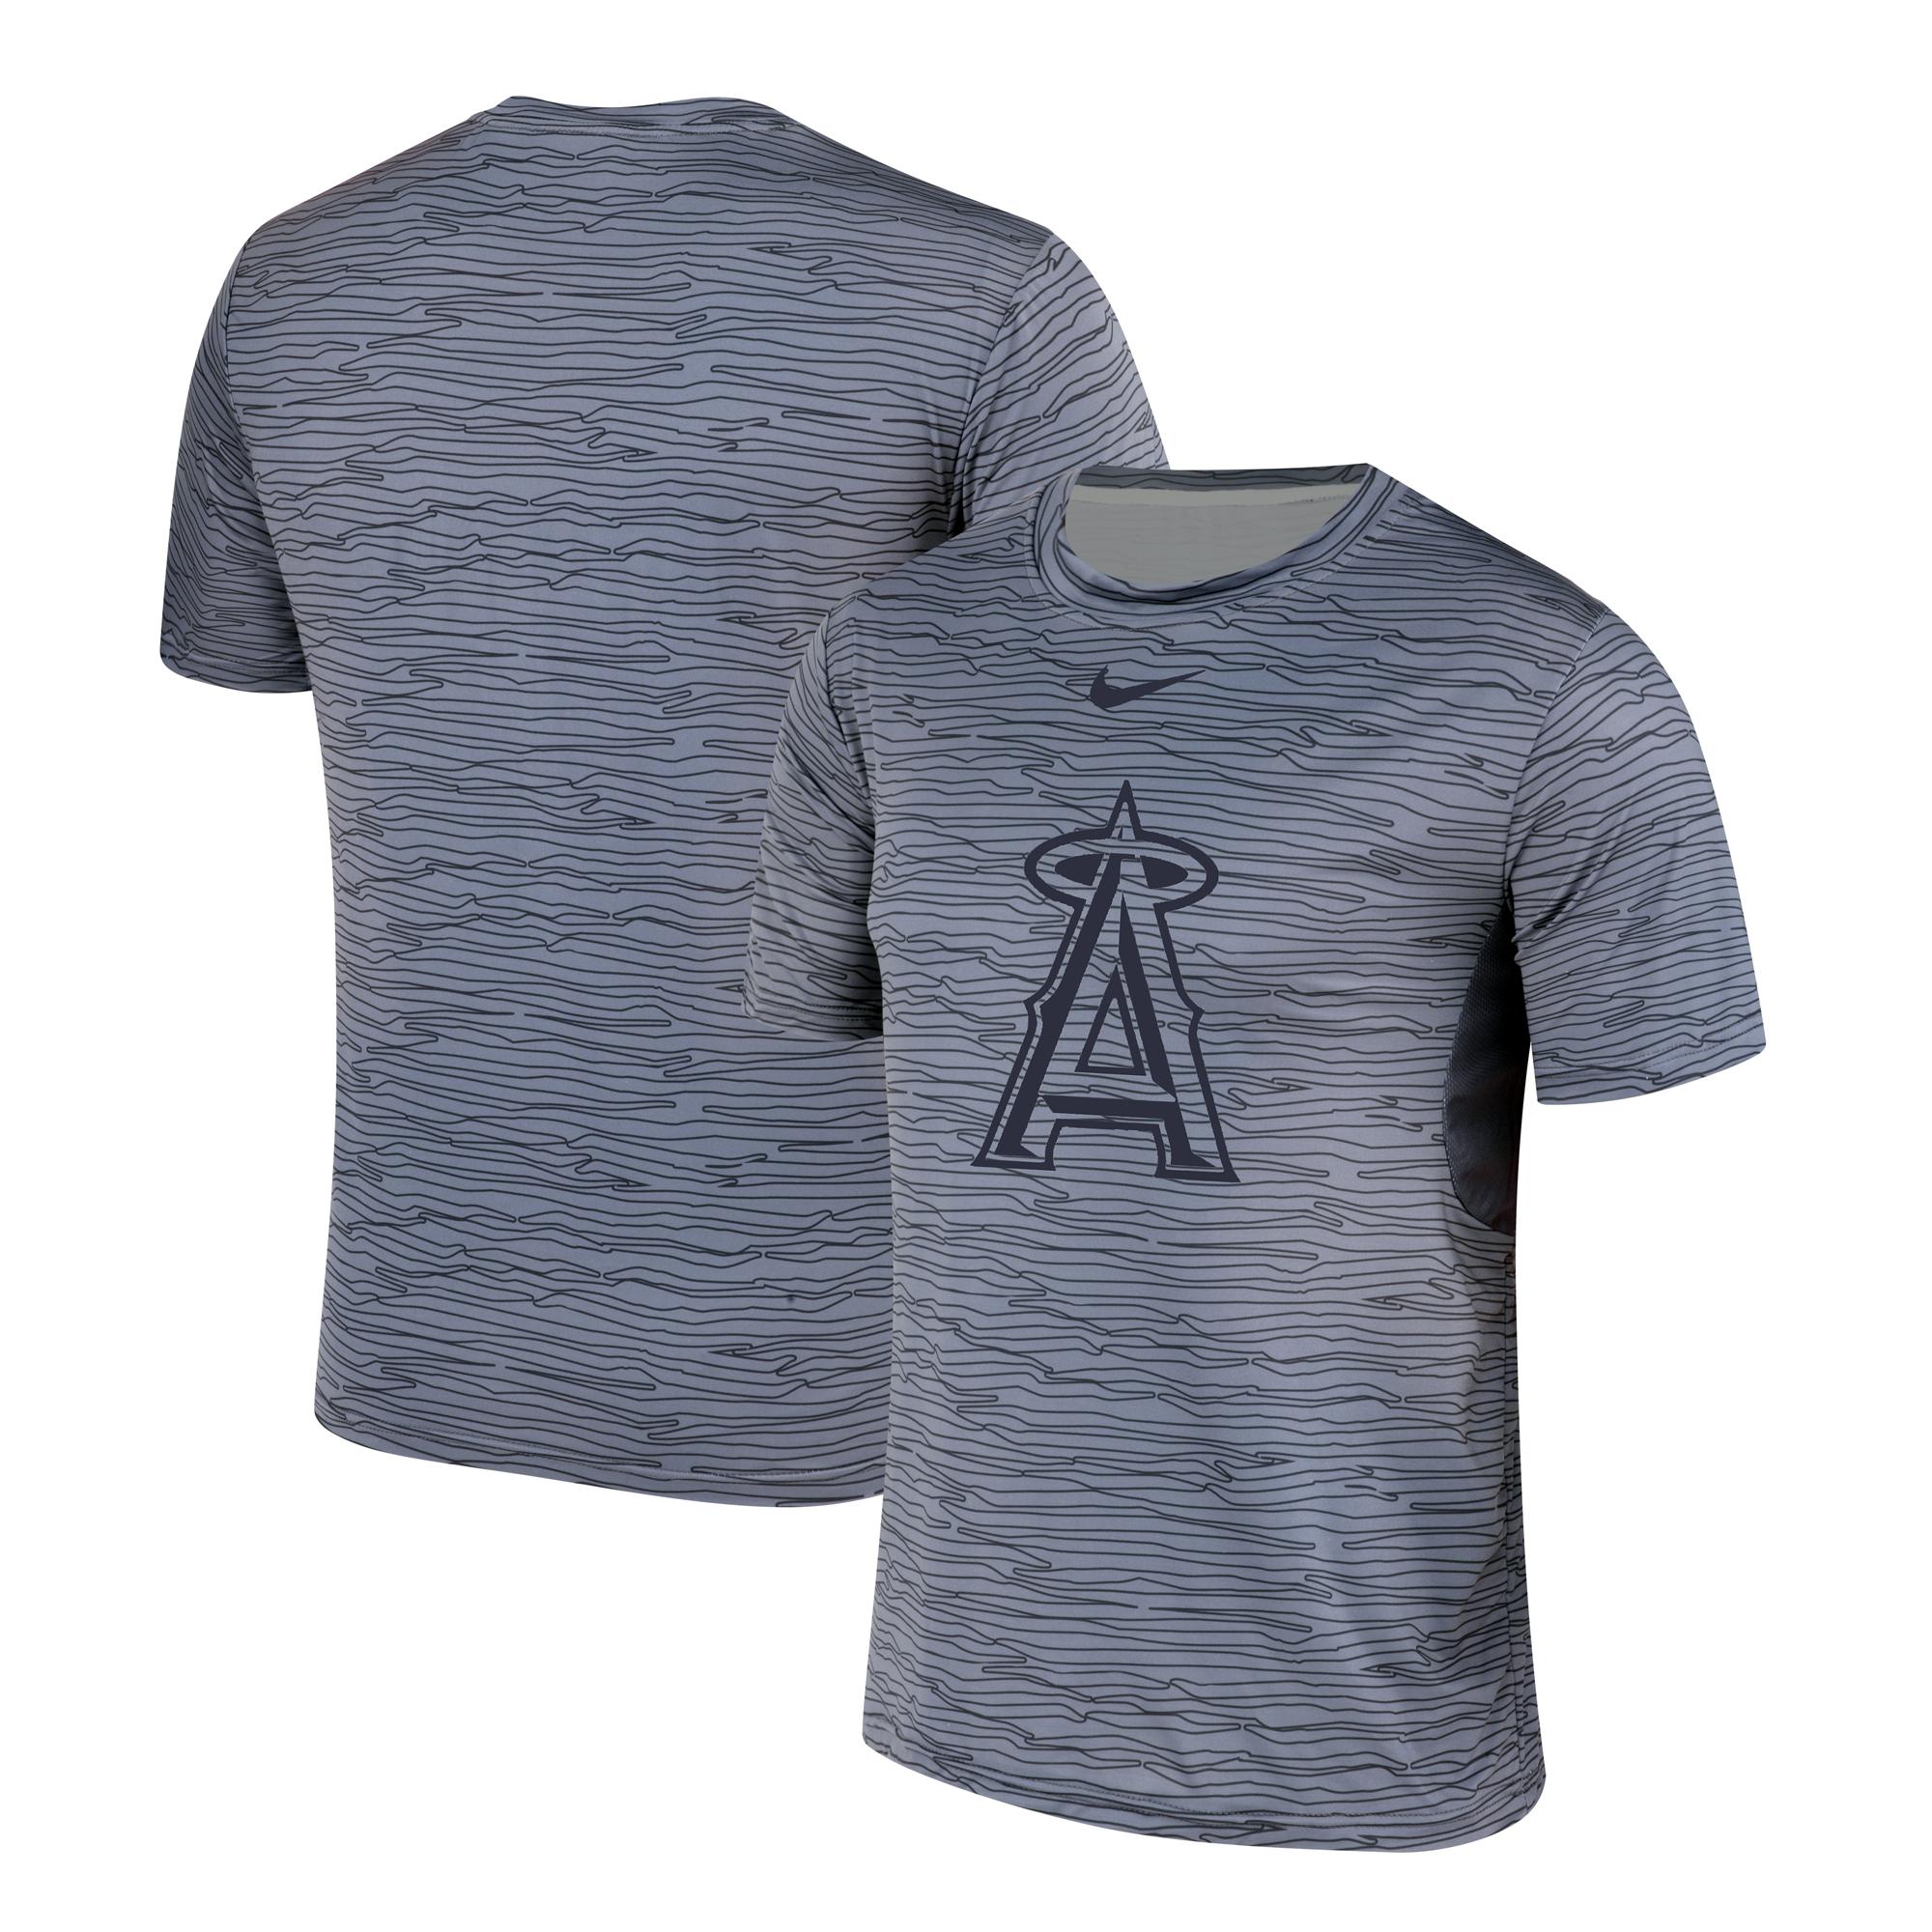 Nike Los Angeles Angels Gray Black Striped Logo Performance T-Shirt